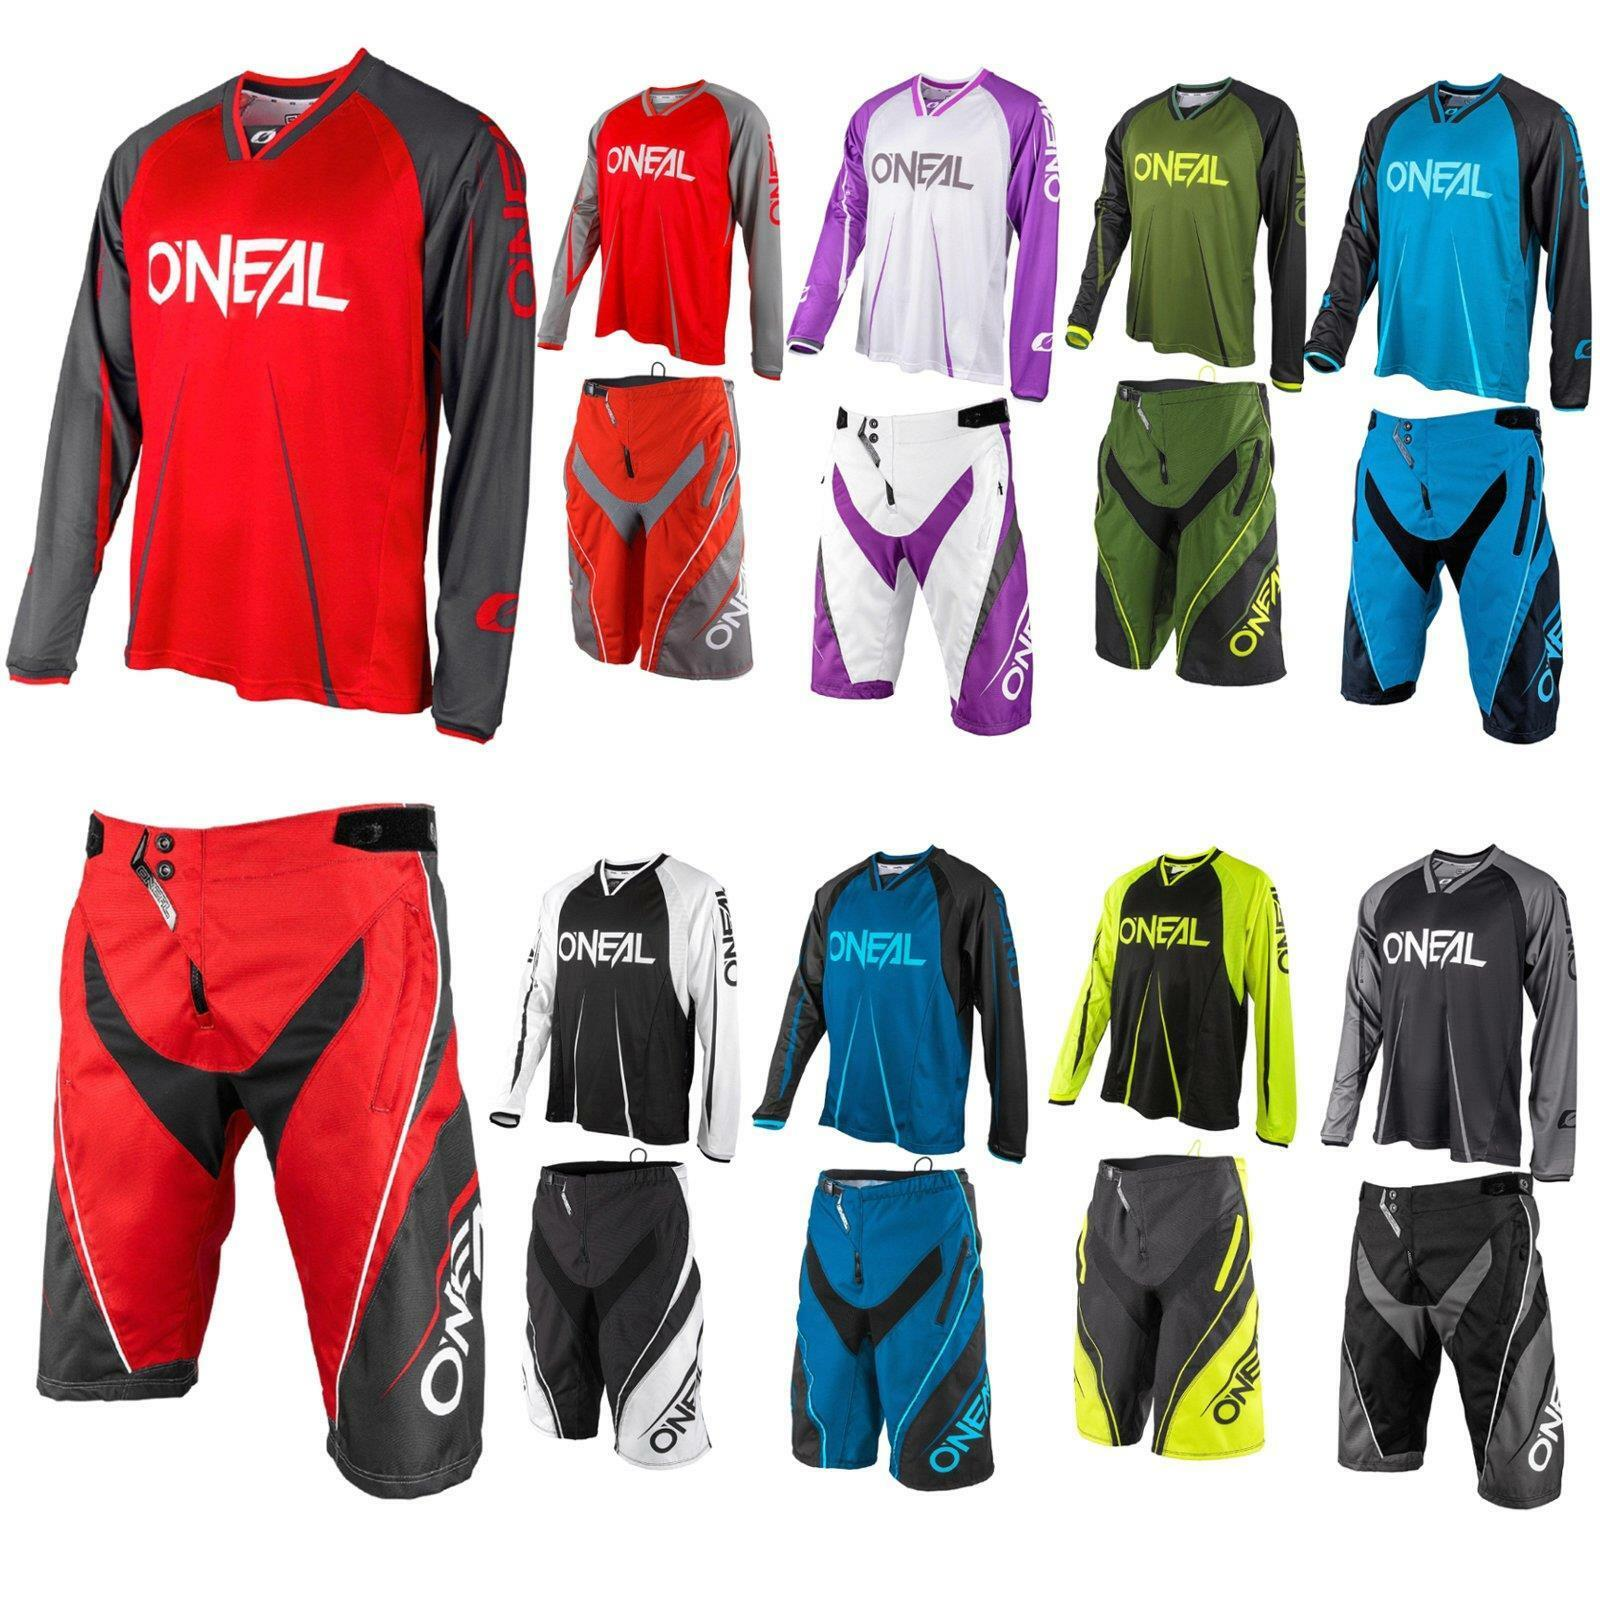 ONEAL Element FR bloccanti Jersey Pantaloncini Maglia Bicicletta Mountainbike MTB pantaloni Pant